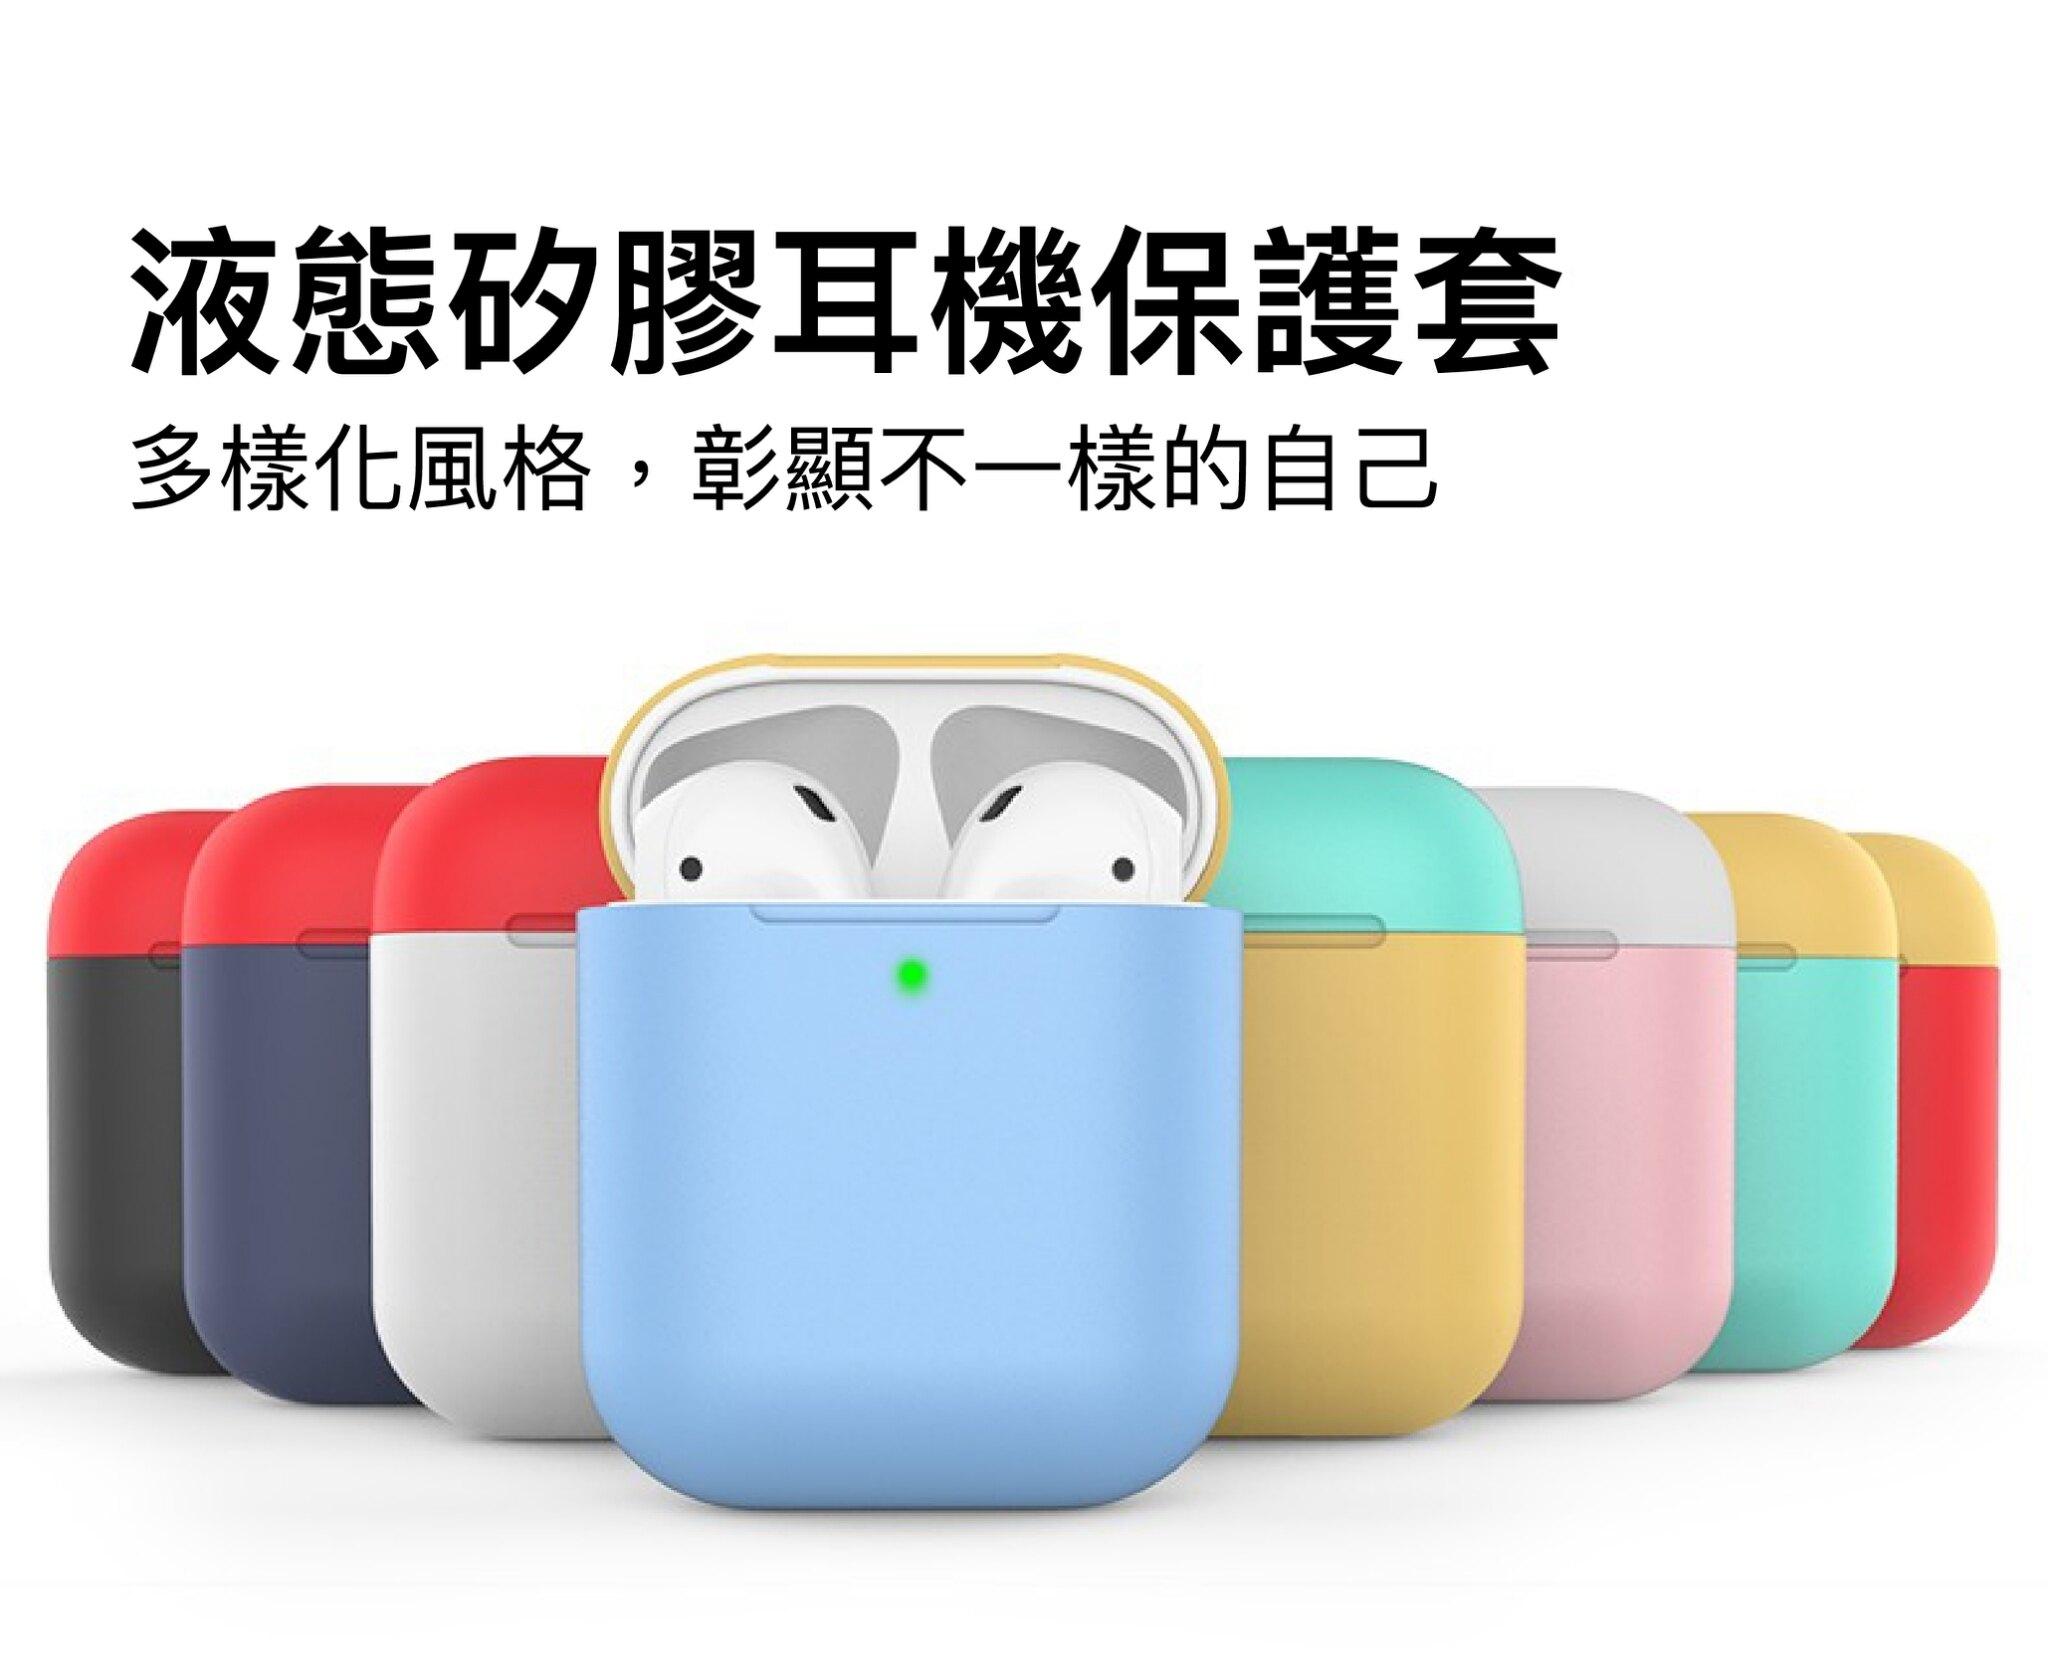 AHAStyle AirPods 撞色款矽膠保護套+超薄止滑耳機套(白)+運動防丟繩(白) 超值組合包